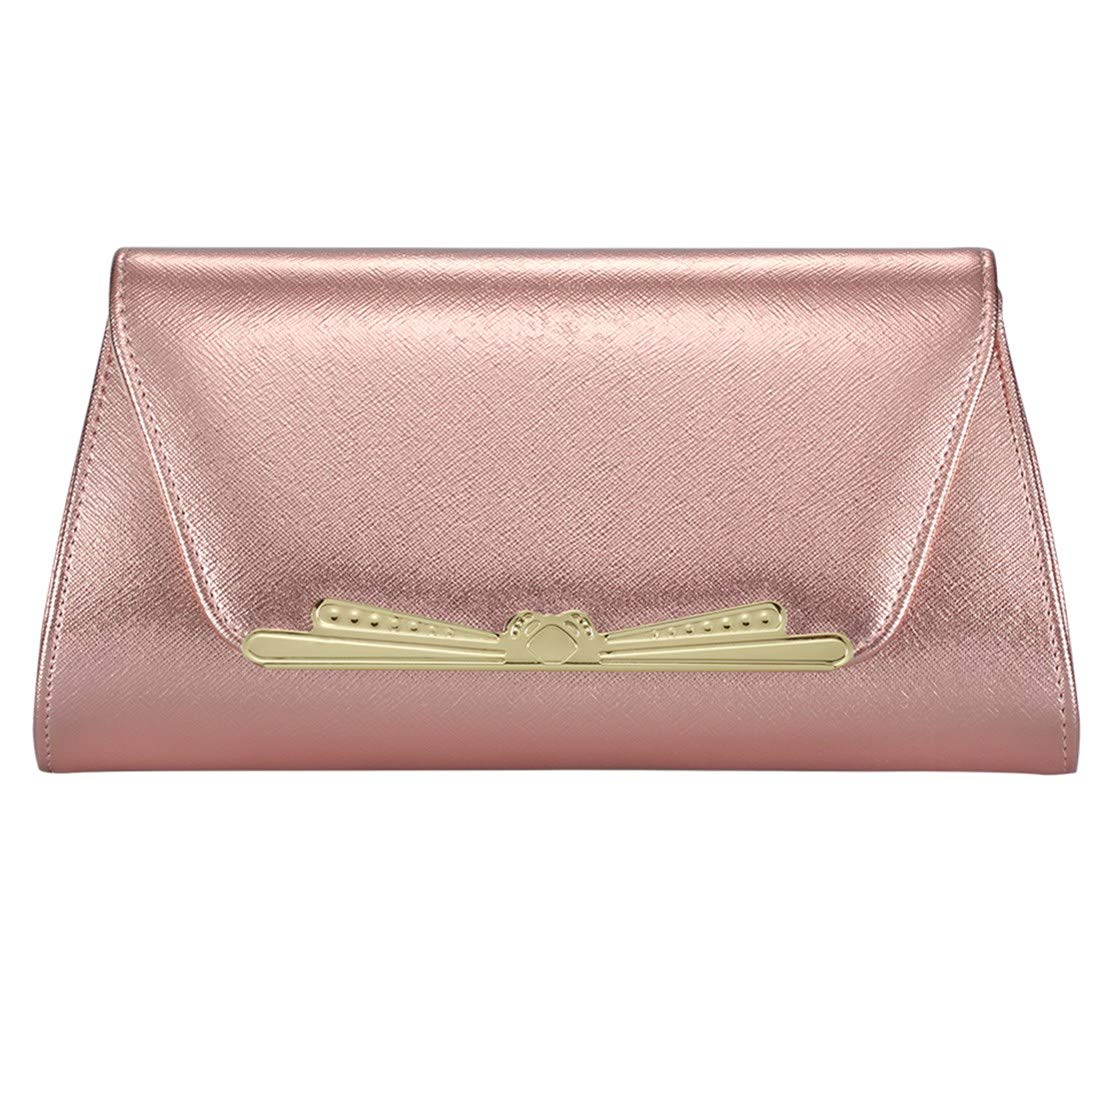 pink gold Women Evening Party Clutch Bags Handbag Crossbody Purse Lady Bag Bridal Wedding Purse